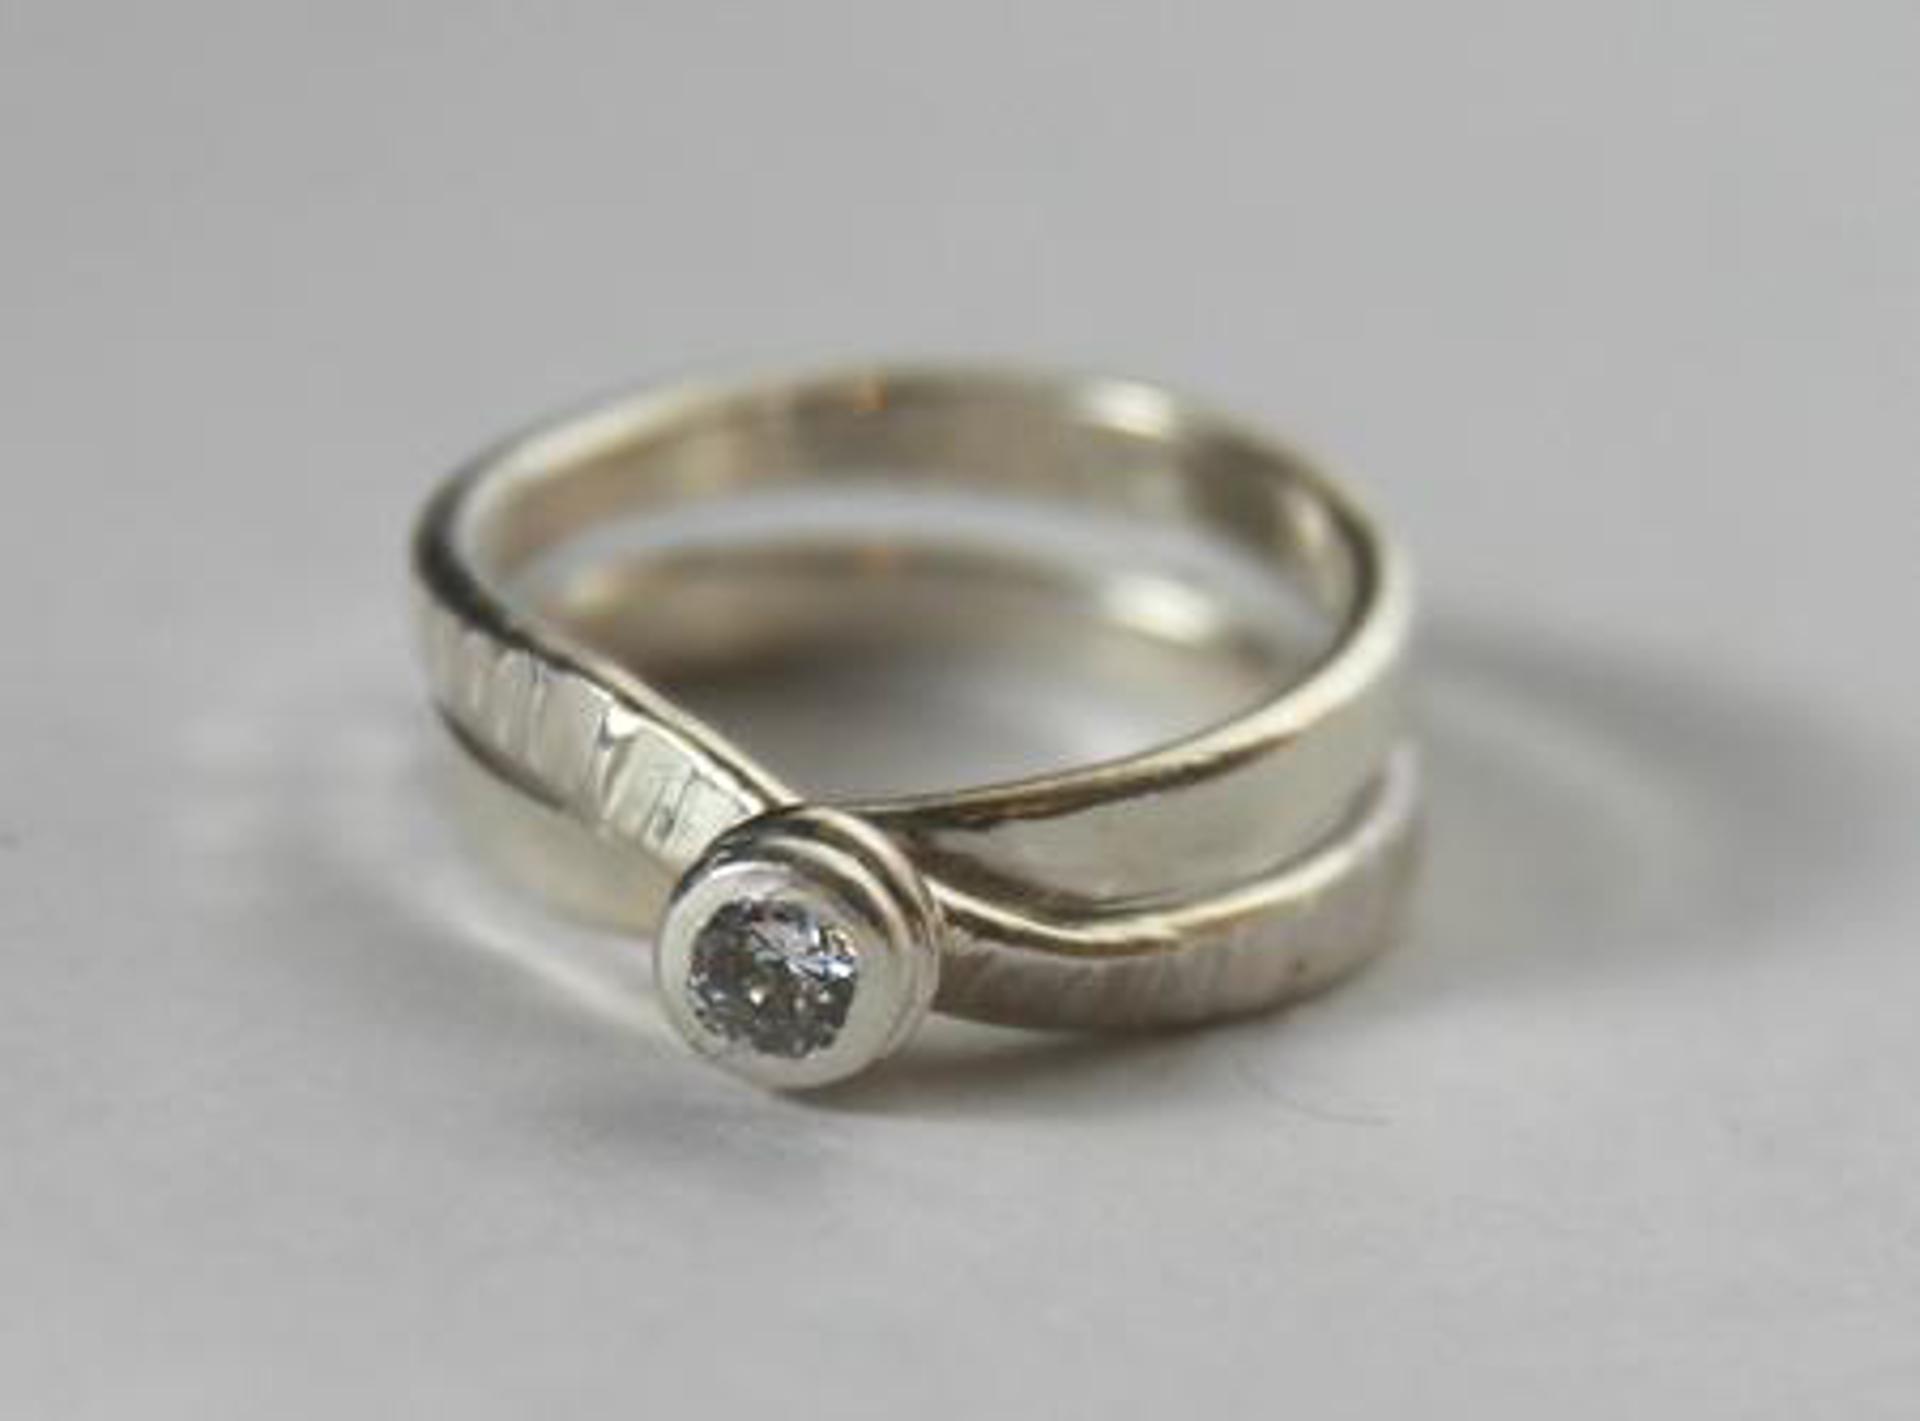 1293-20 Ring by Donna Burdic